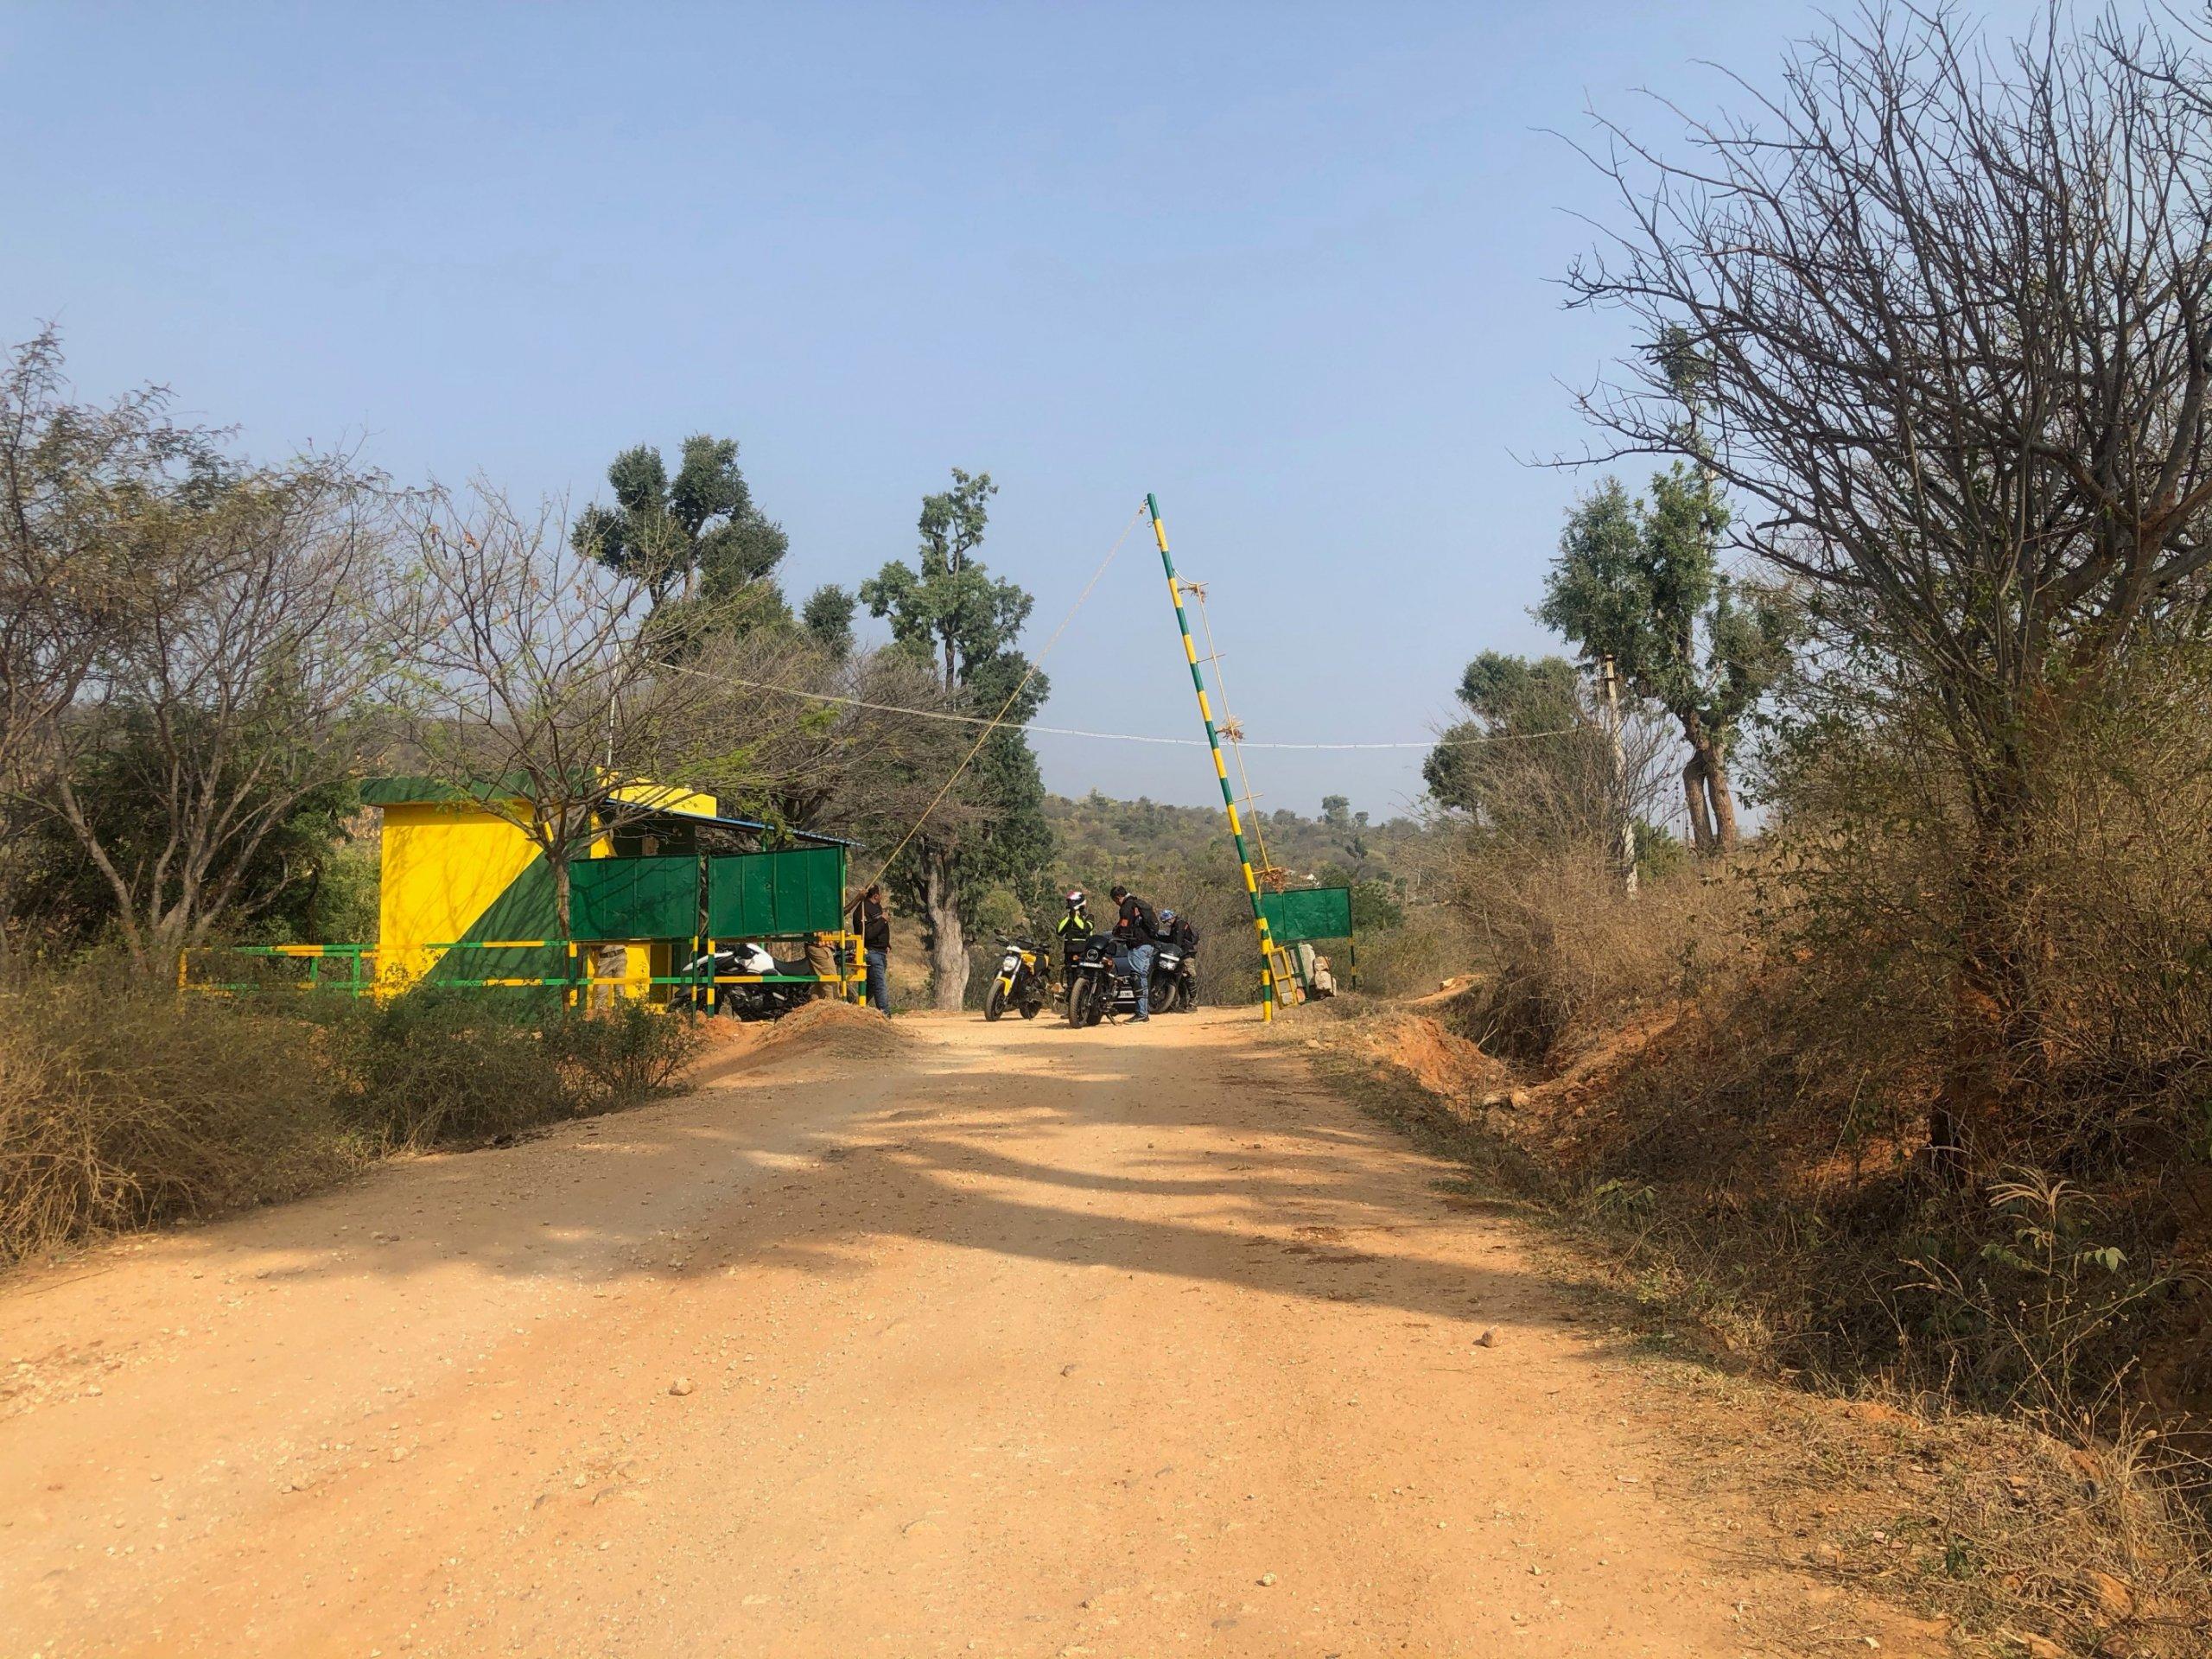 Dabbaguli Entry Gate